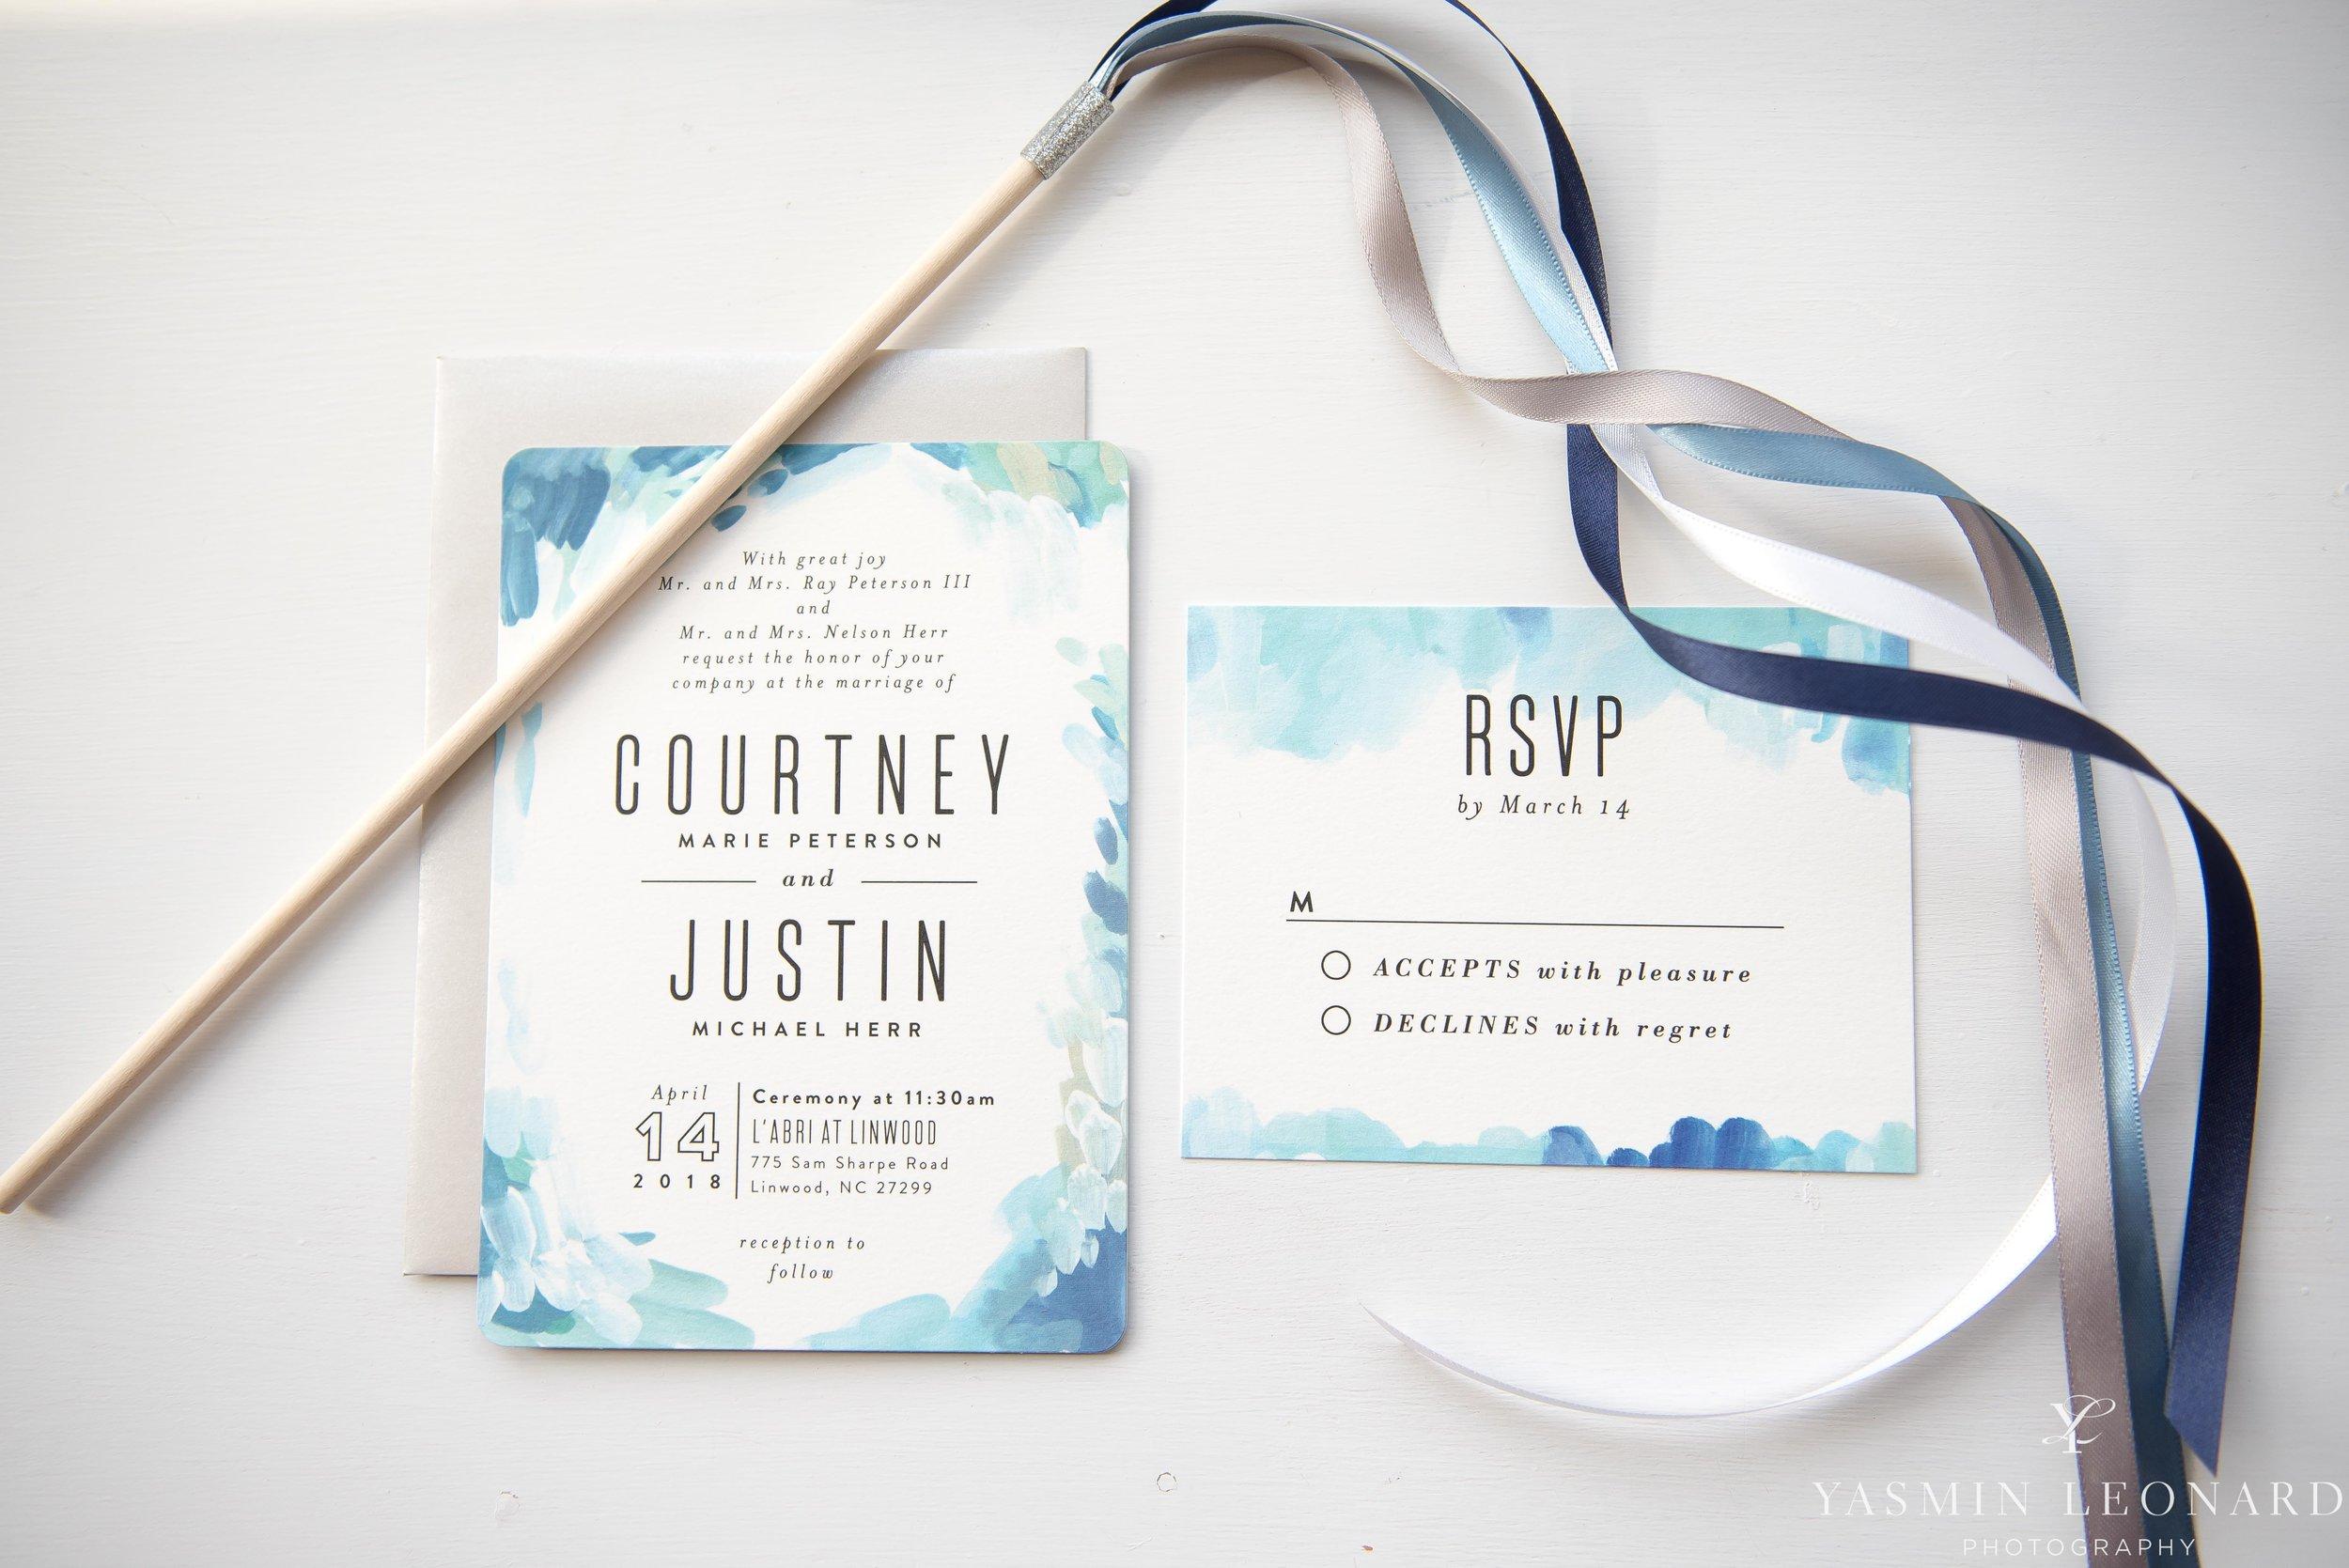 Courtney and Justin - L'abri at Linwood - Yasmin Leonard Photography-1.jpg